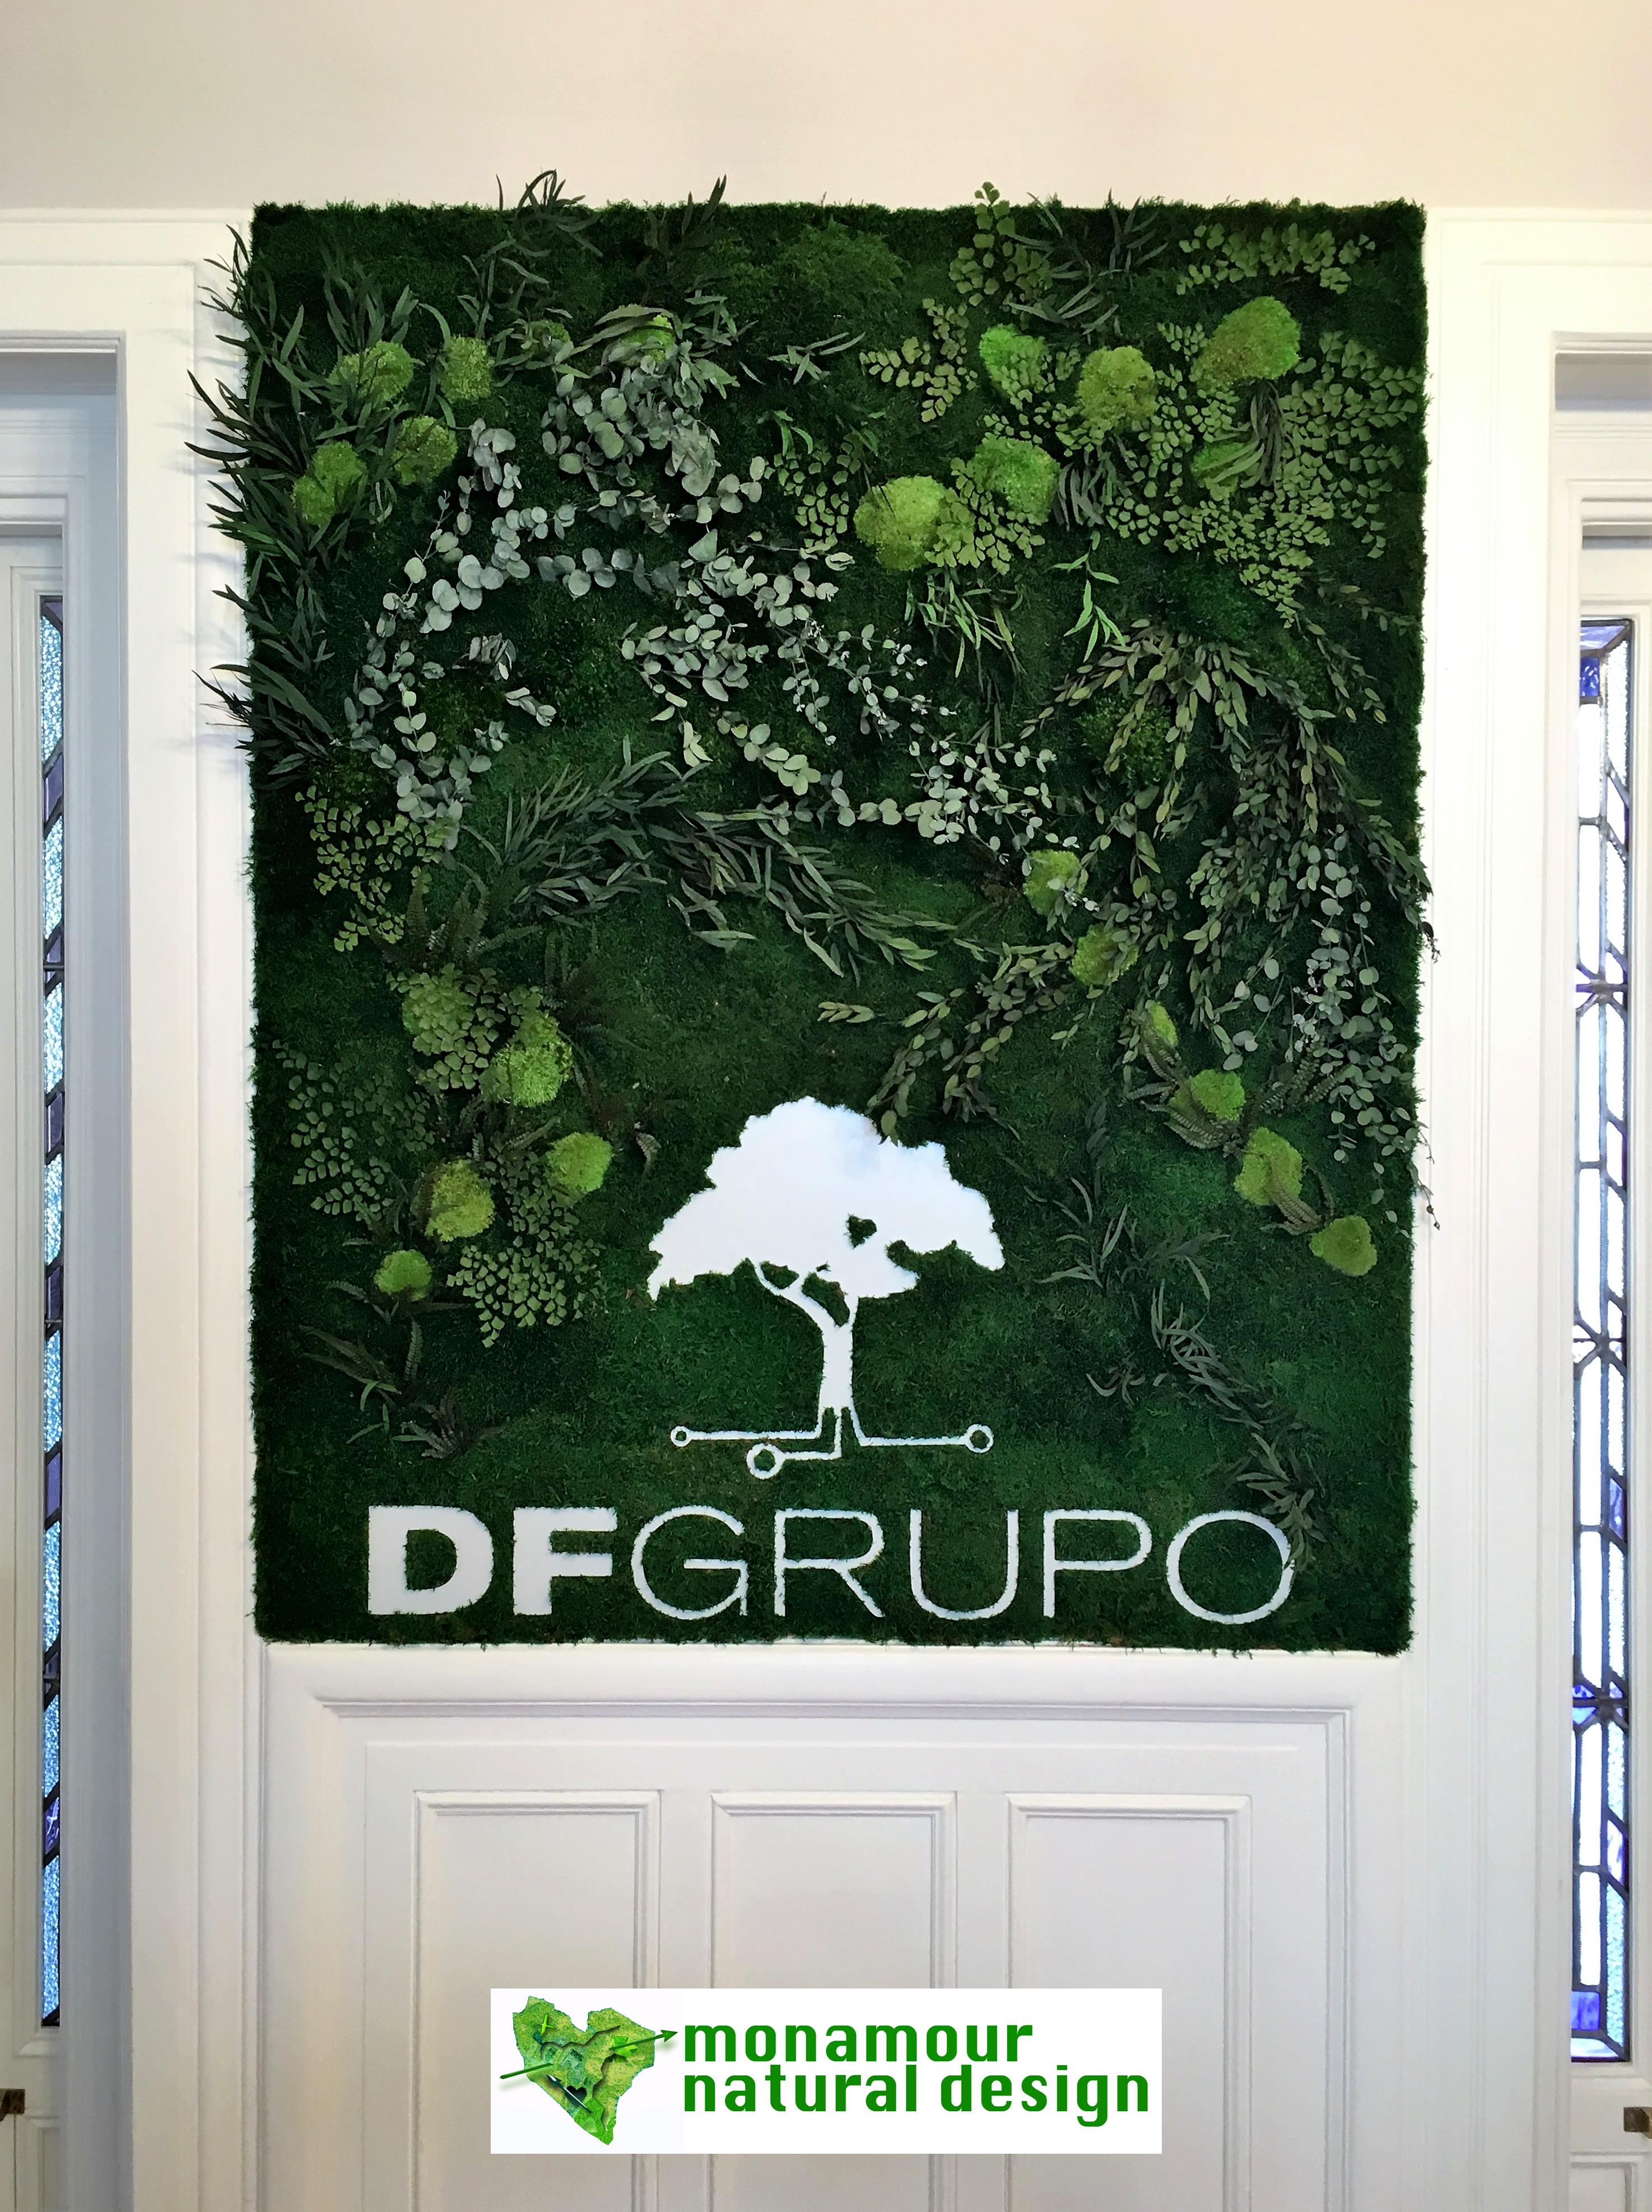 DF Grupo (2)MND